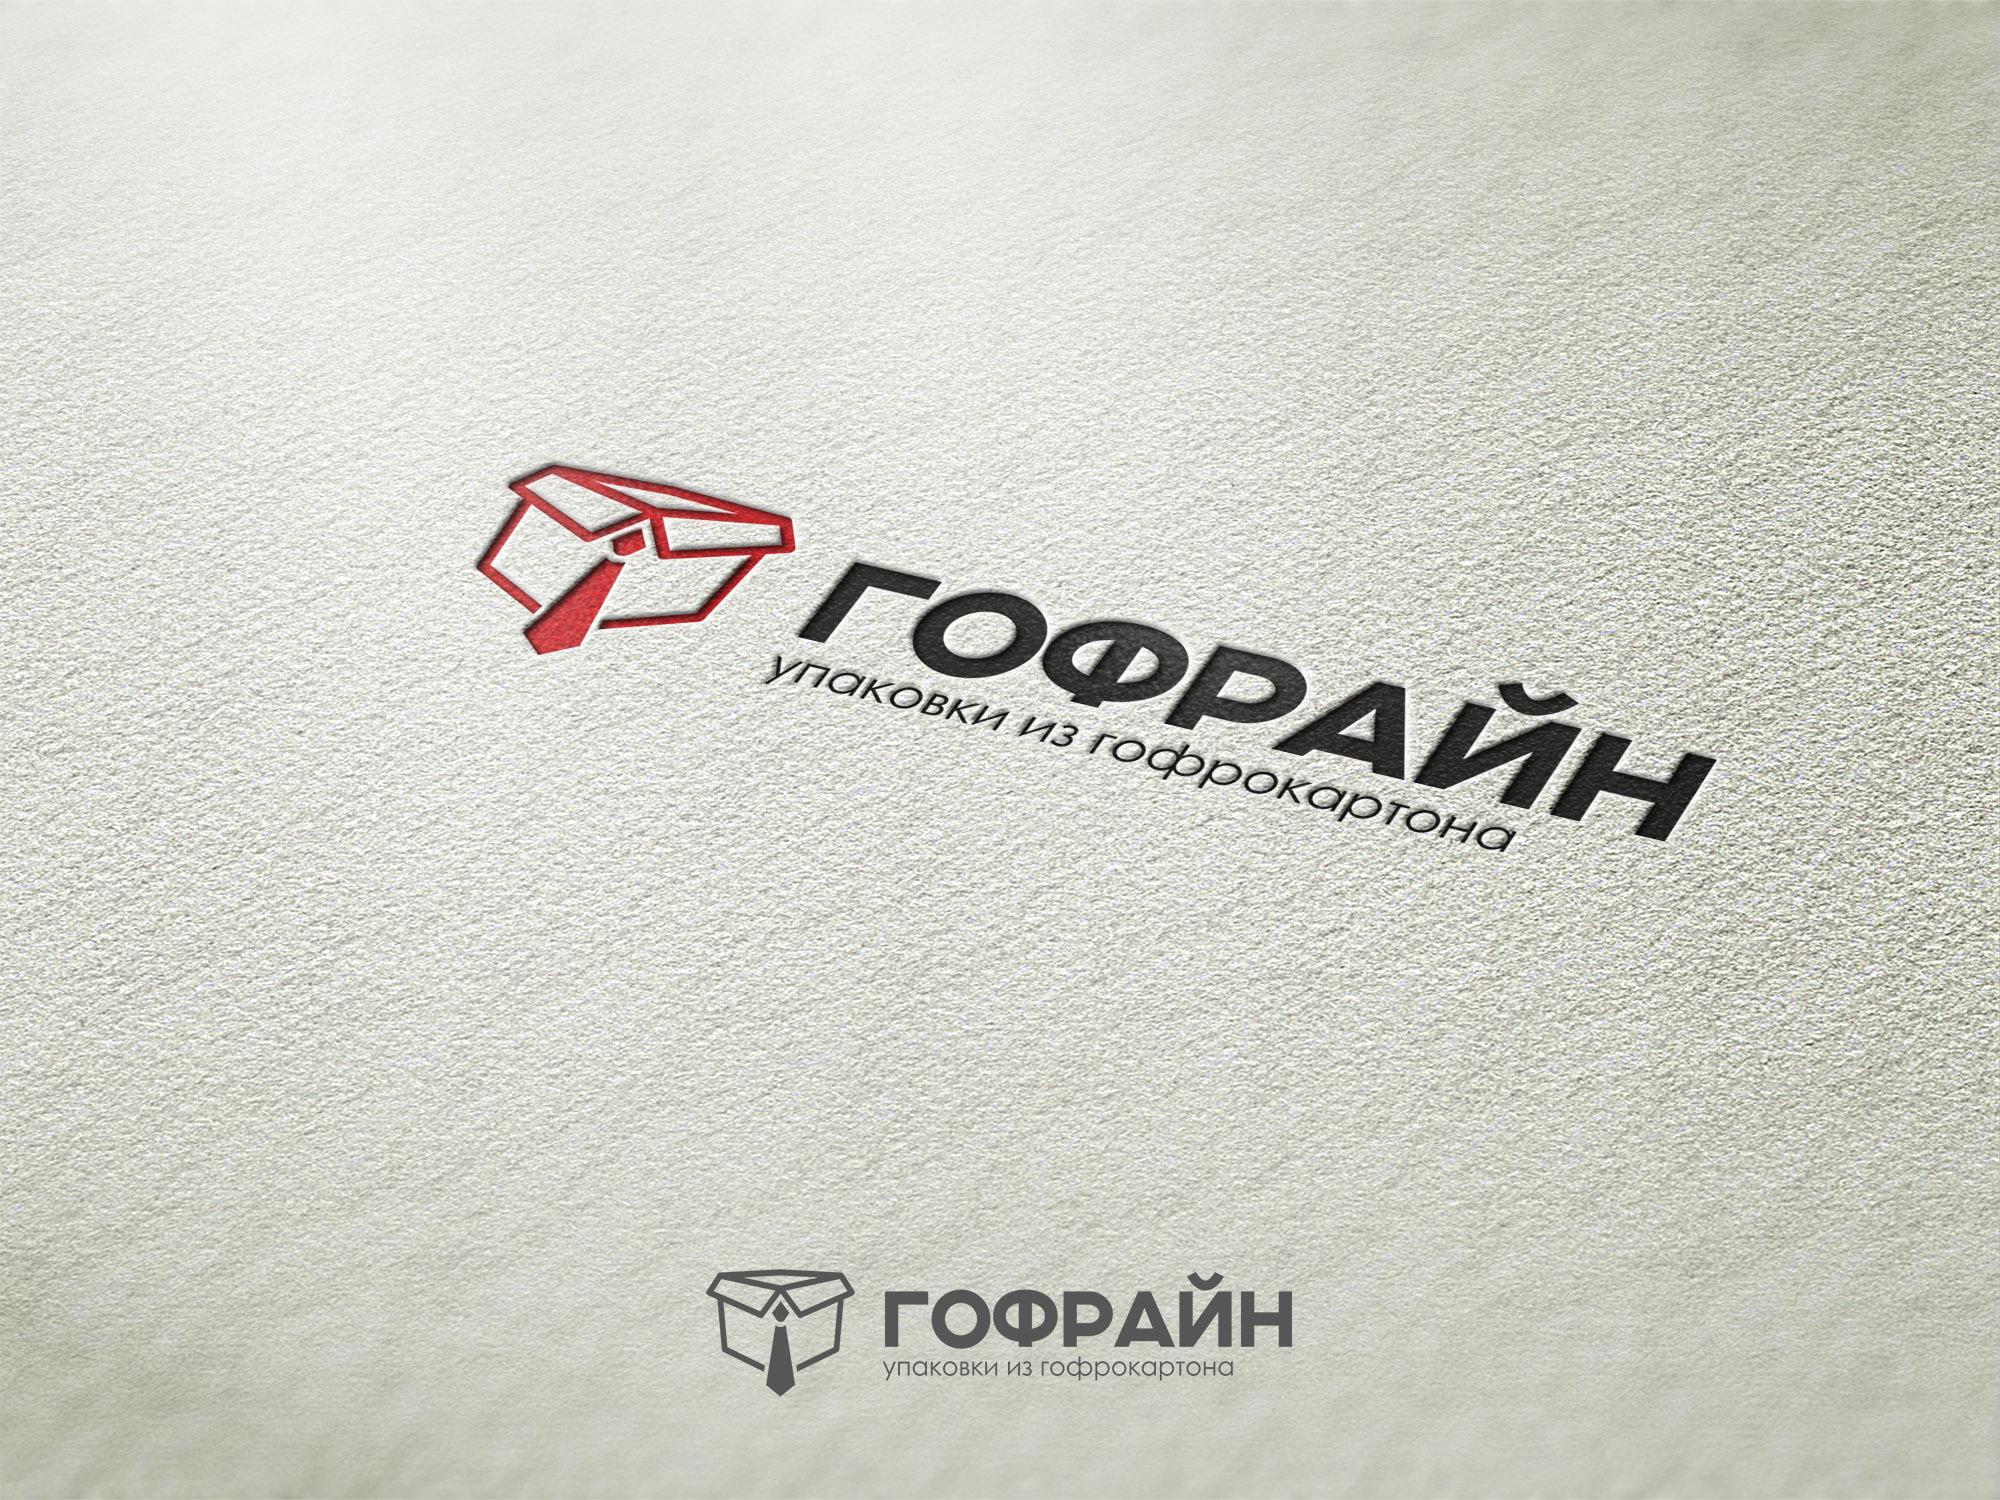 Логотип для компании по реализации упаковки из гофрокартона фото f_5245cdb95188ba88.jpg